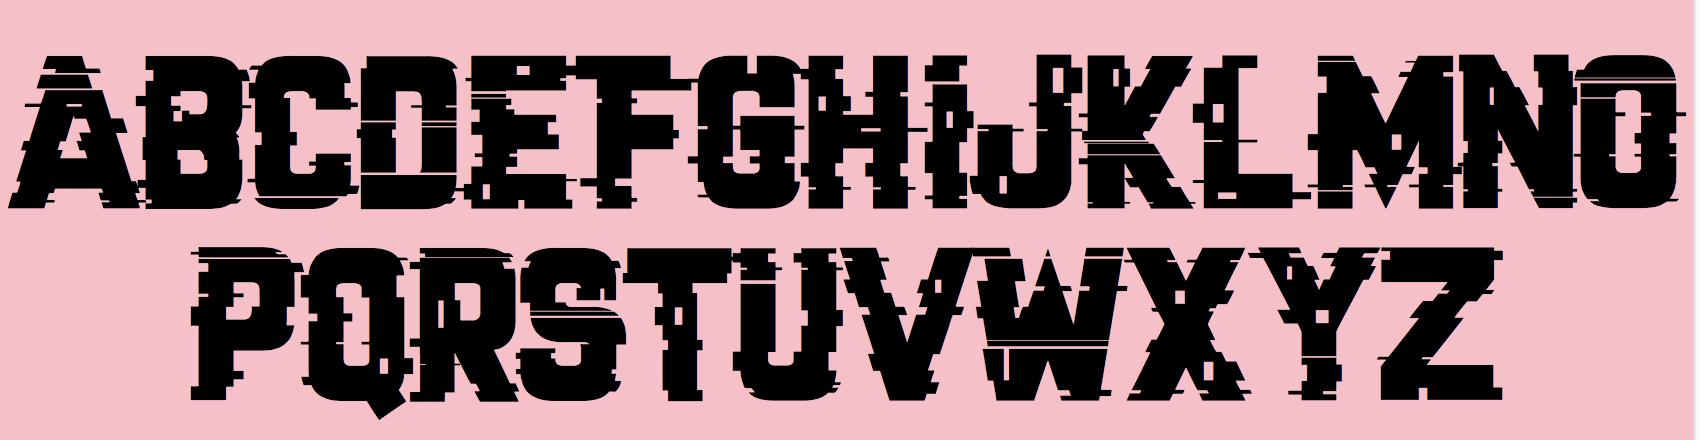 Graphik Black Font On Silver - sevenval